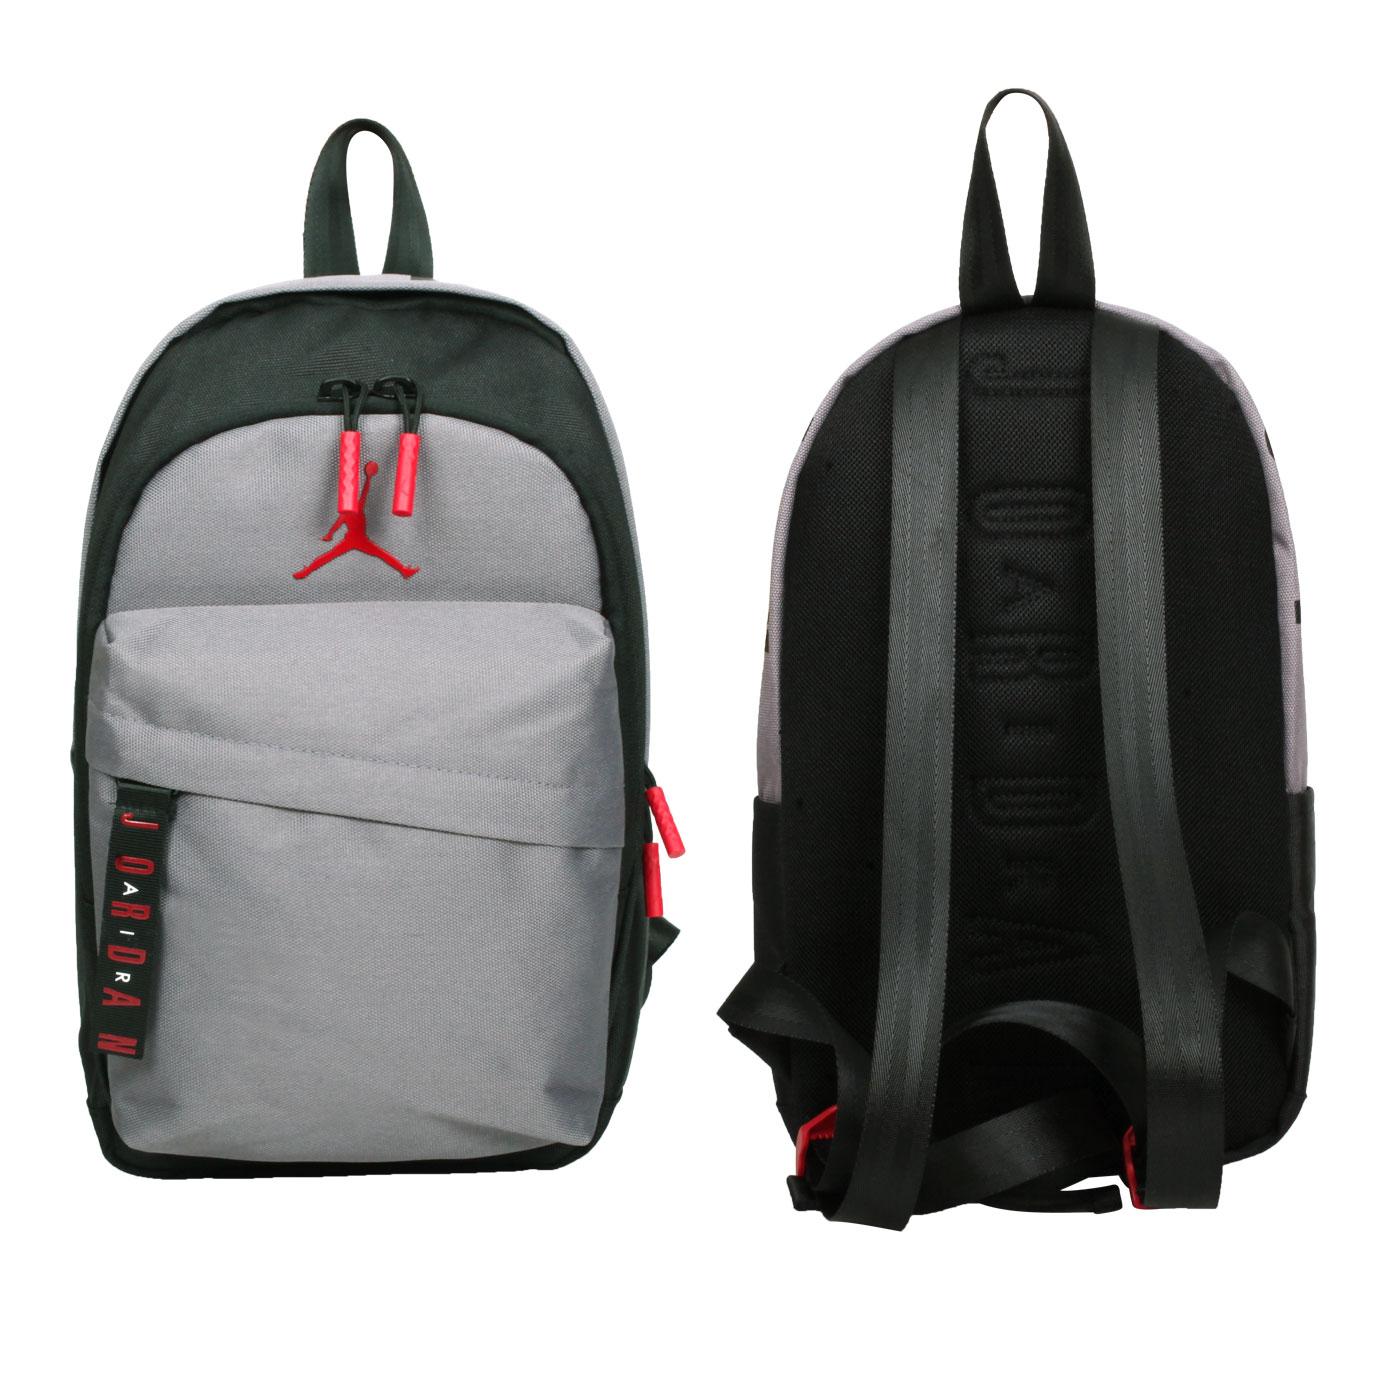 NIKE 小型雙肩包 JD2123006TD-002 - 黑灰紅